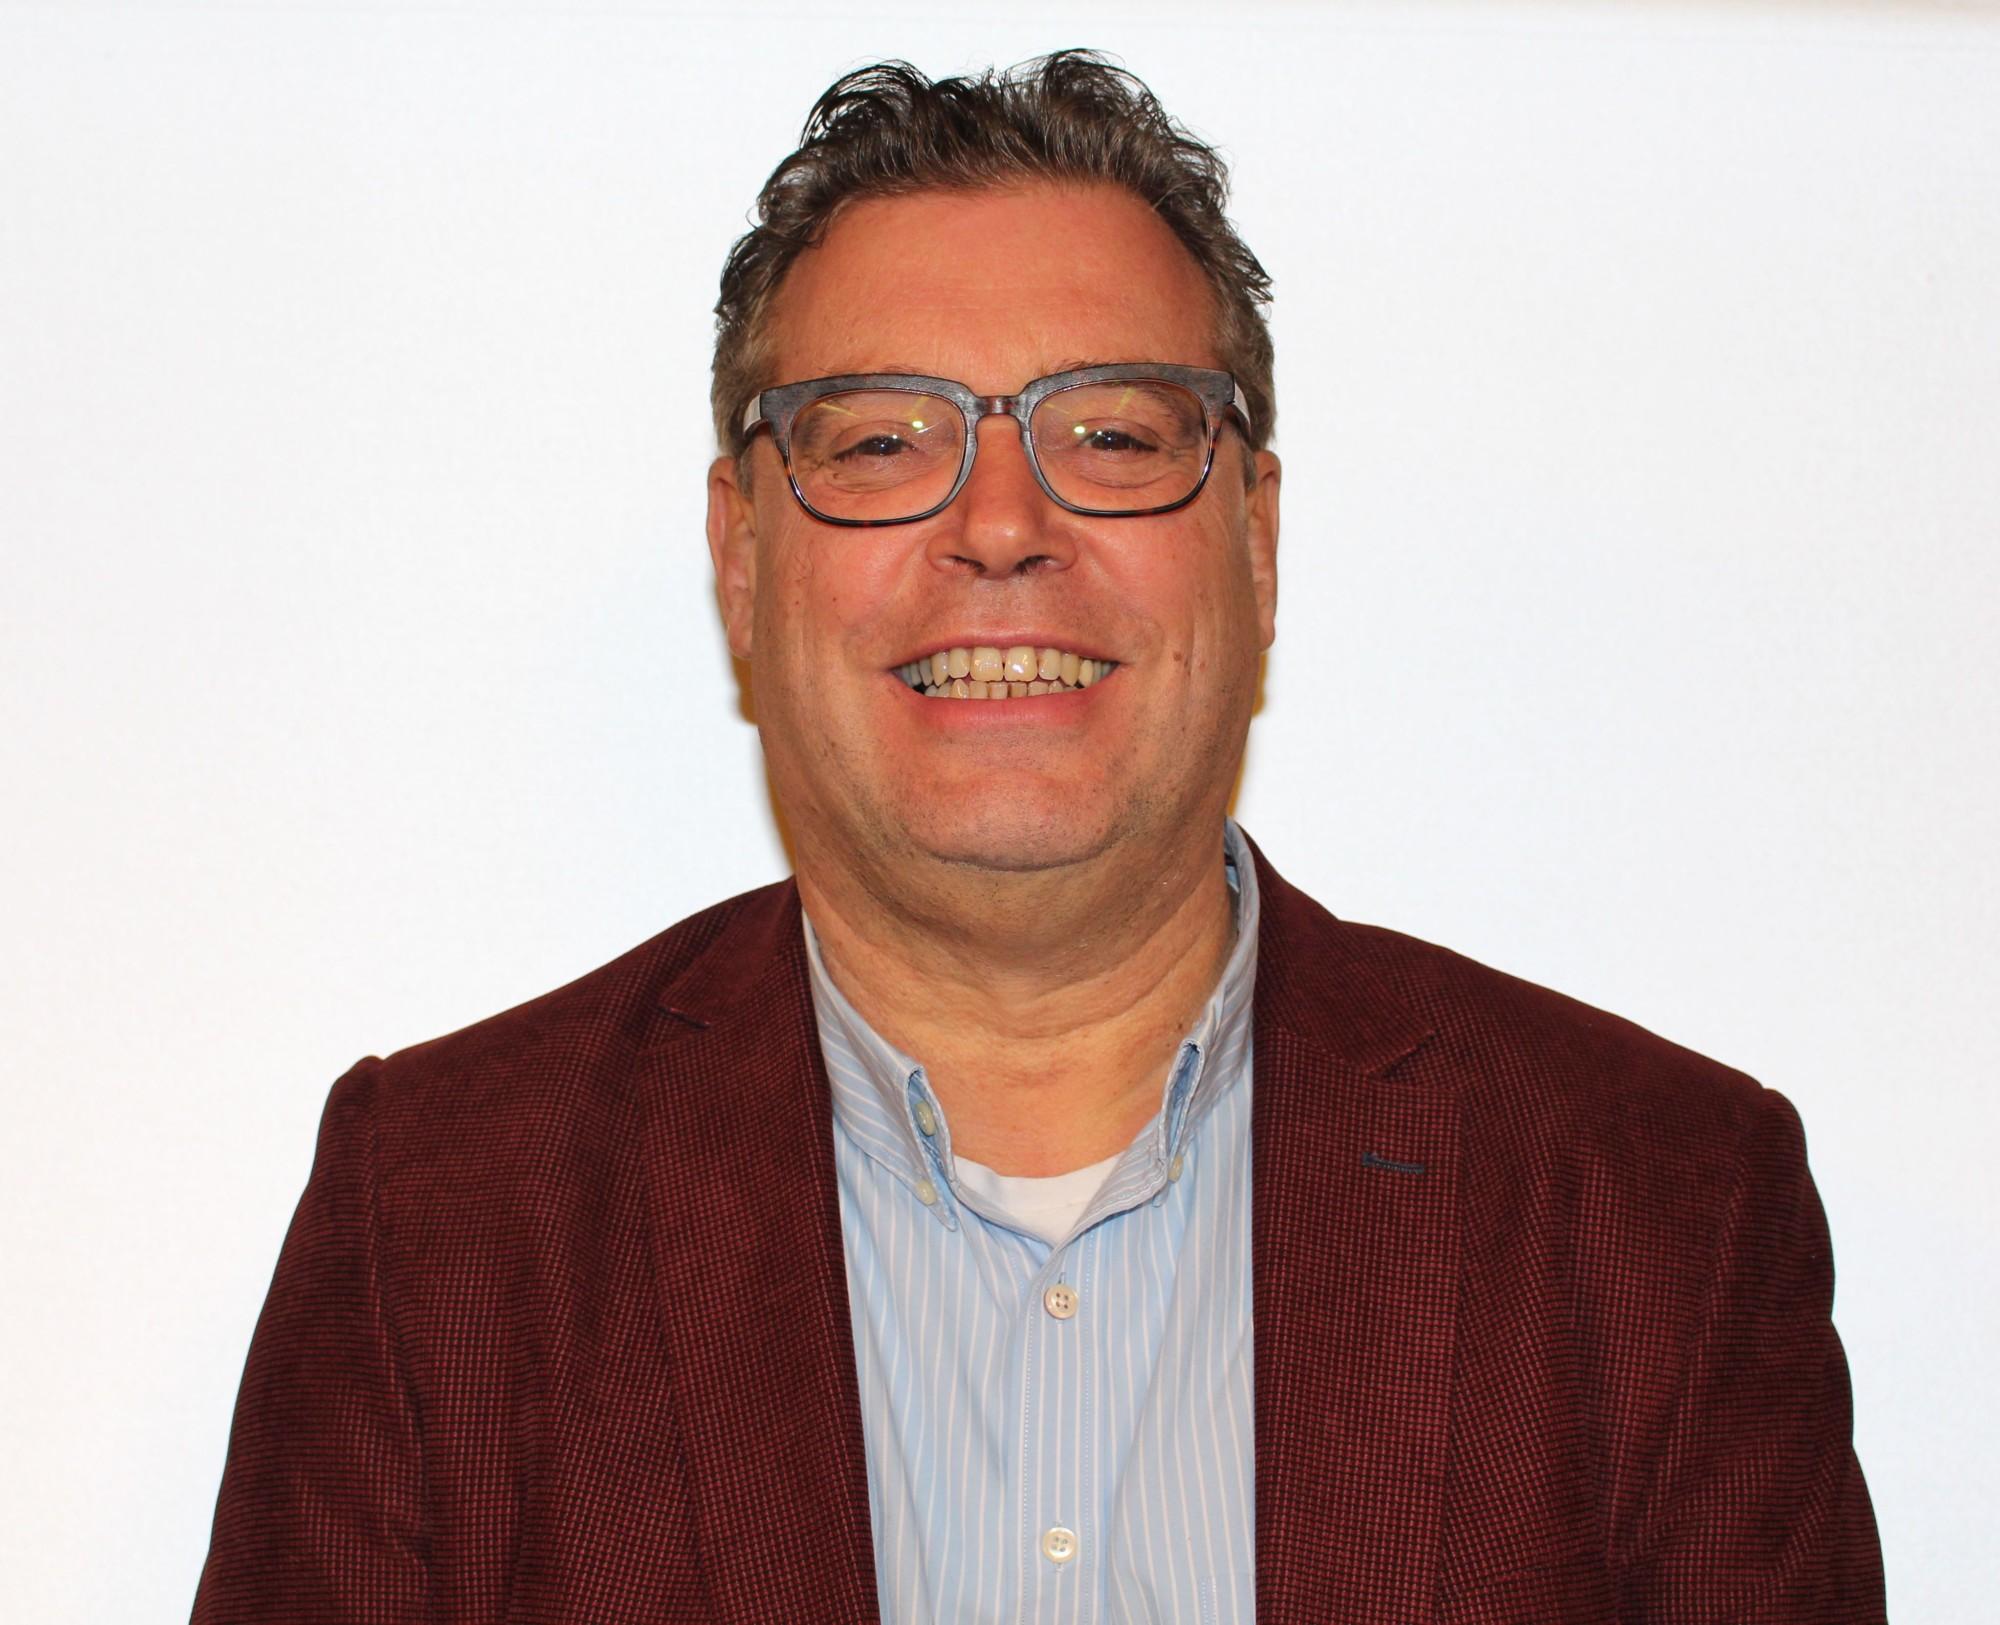 Michel Engelsman